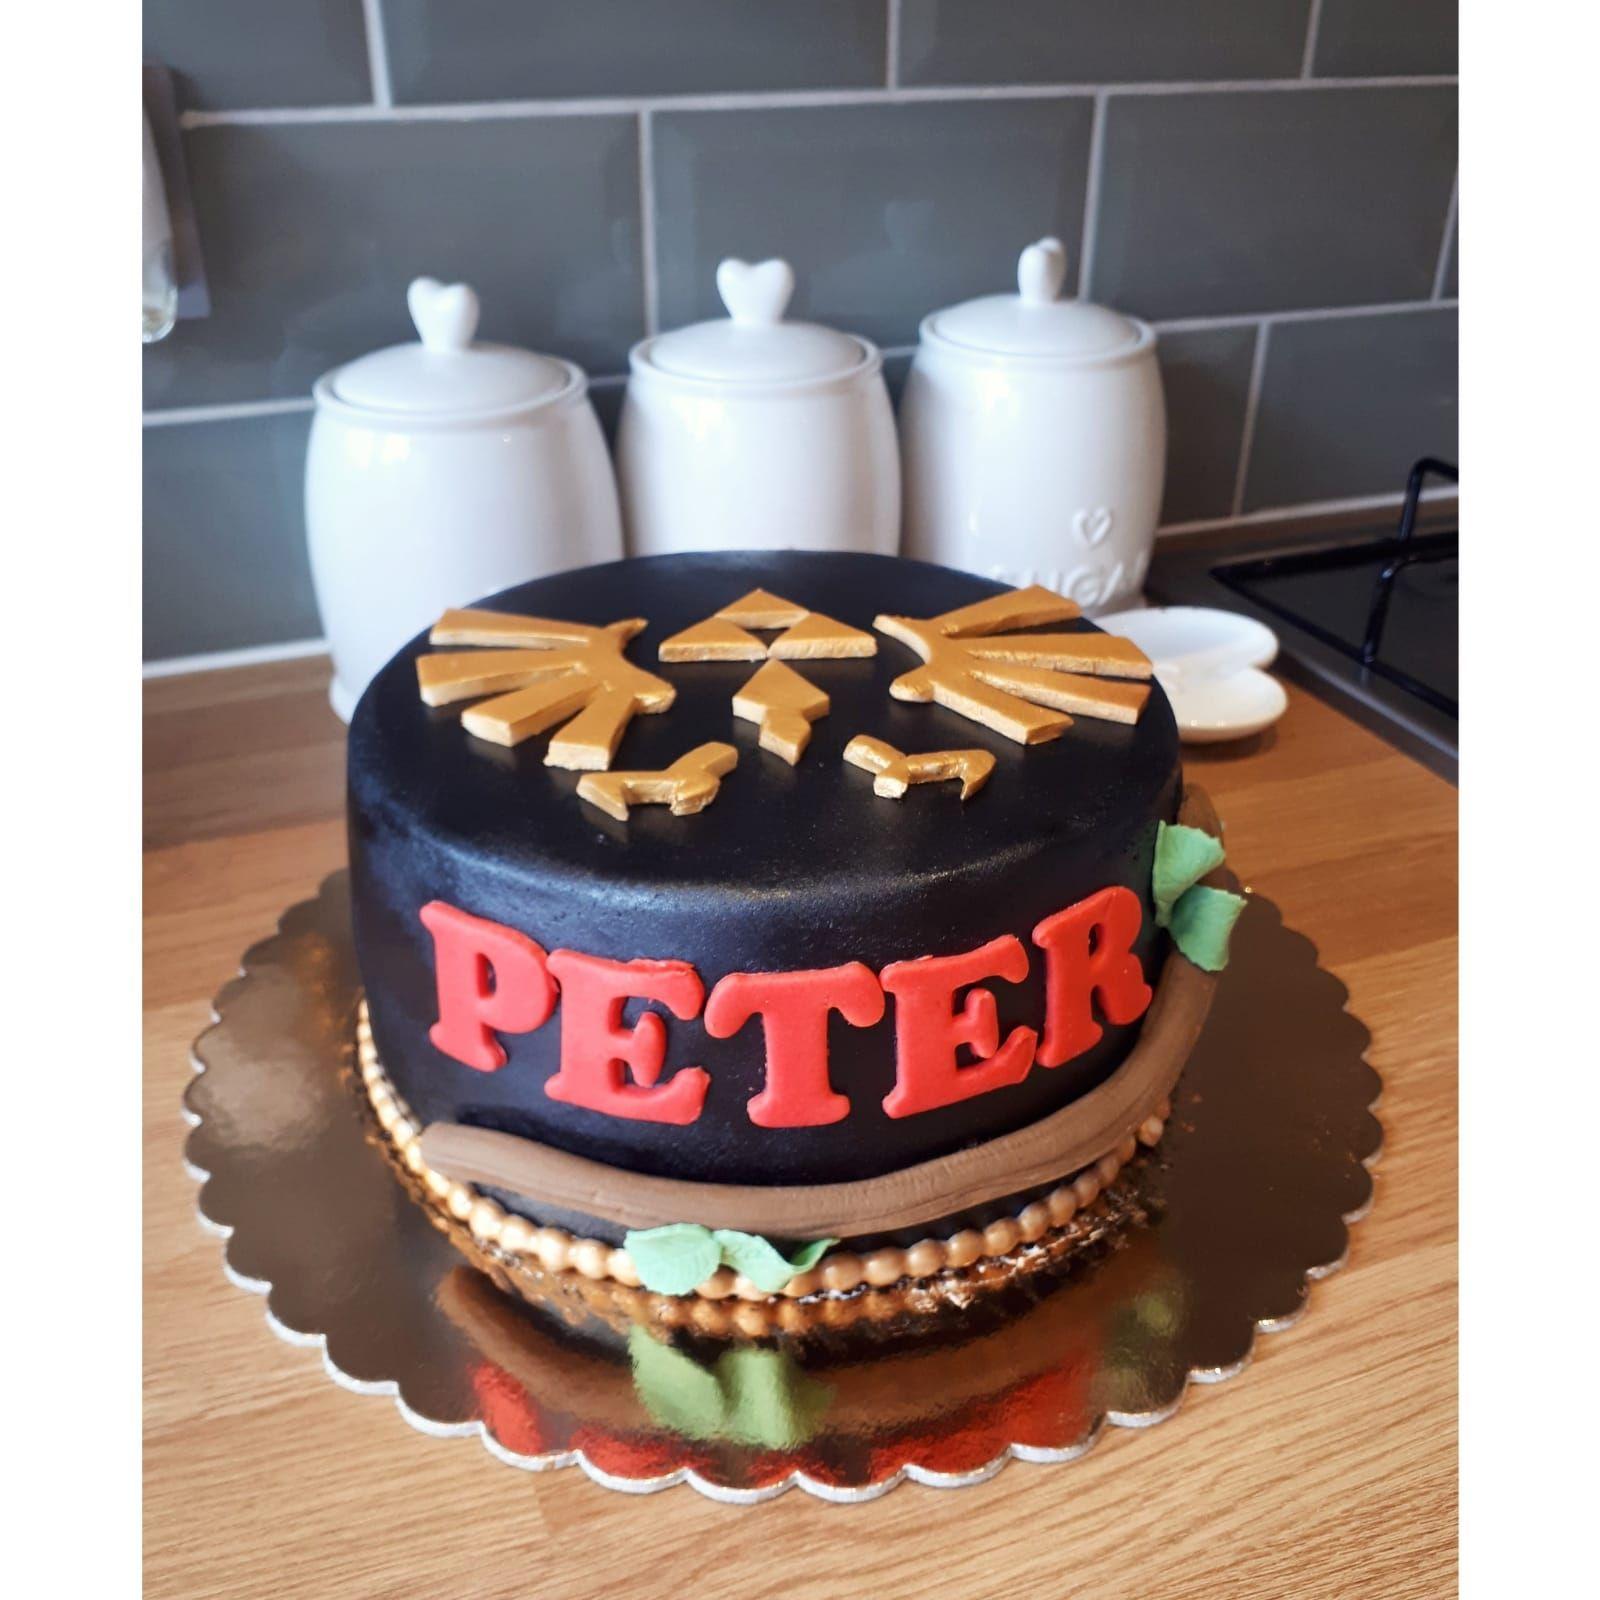 MM ideas How to make cake, 28th birthday, Cake